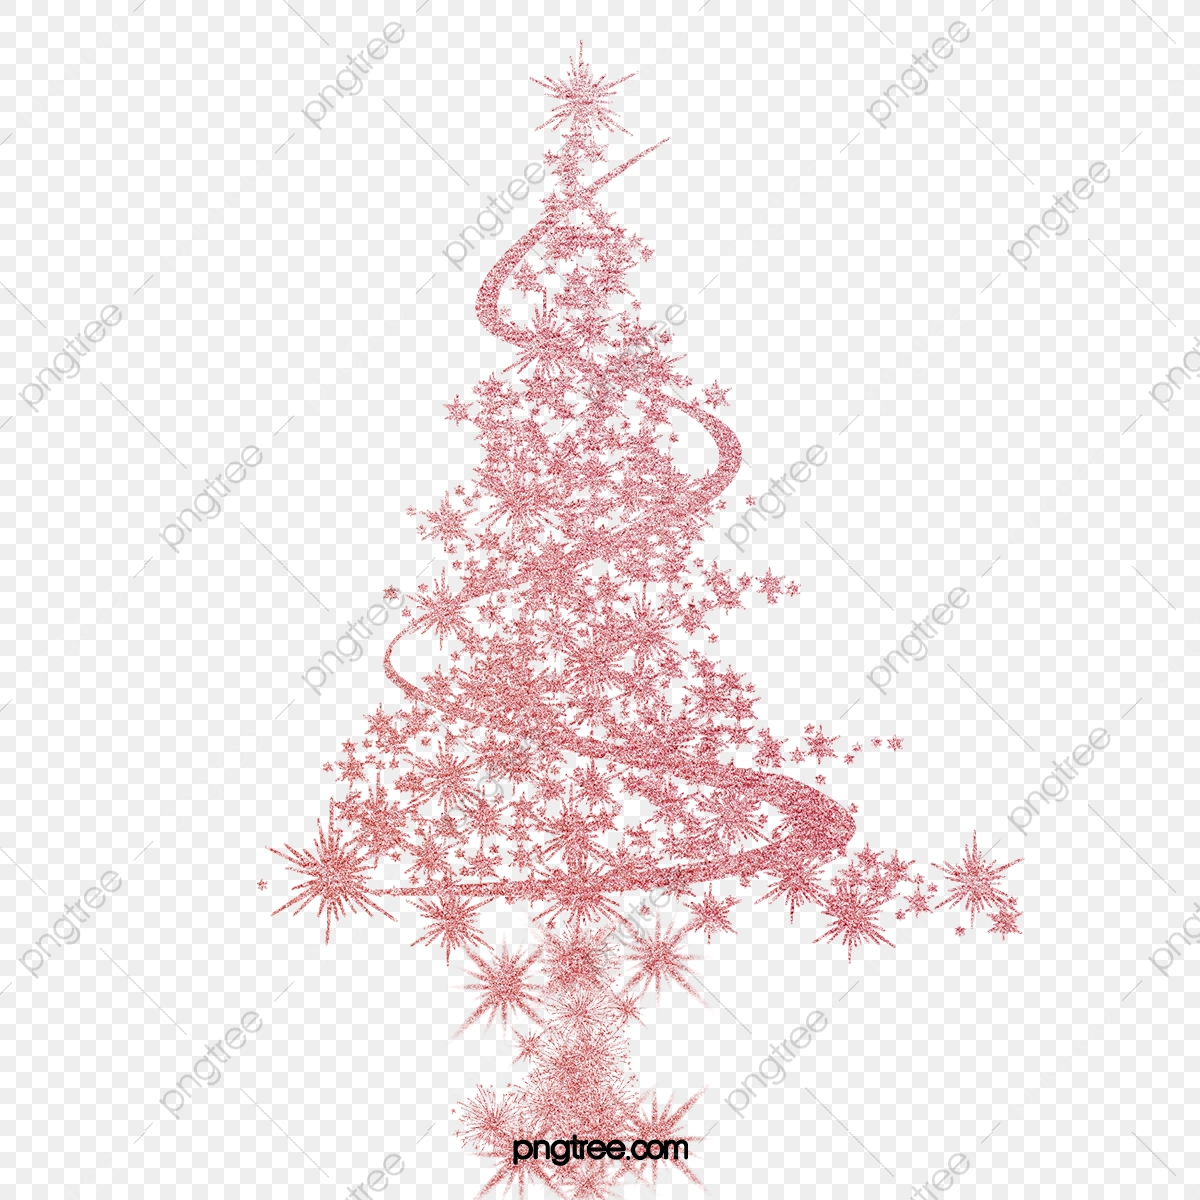 Gambar Mawar Emas Kreatif Bintang Bintang Kombinasi Pohon Natal Kreatif Portfolio Pohon Natal Bintang Bintang Png Dan Psd Untuk Muat Turun Percuma